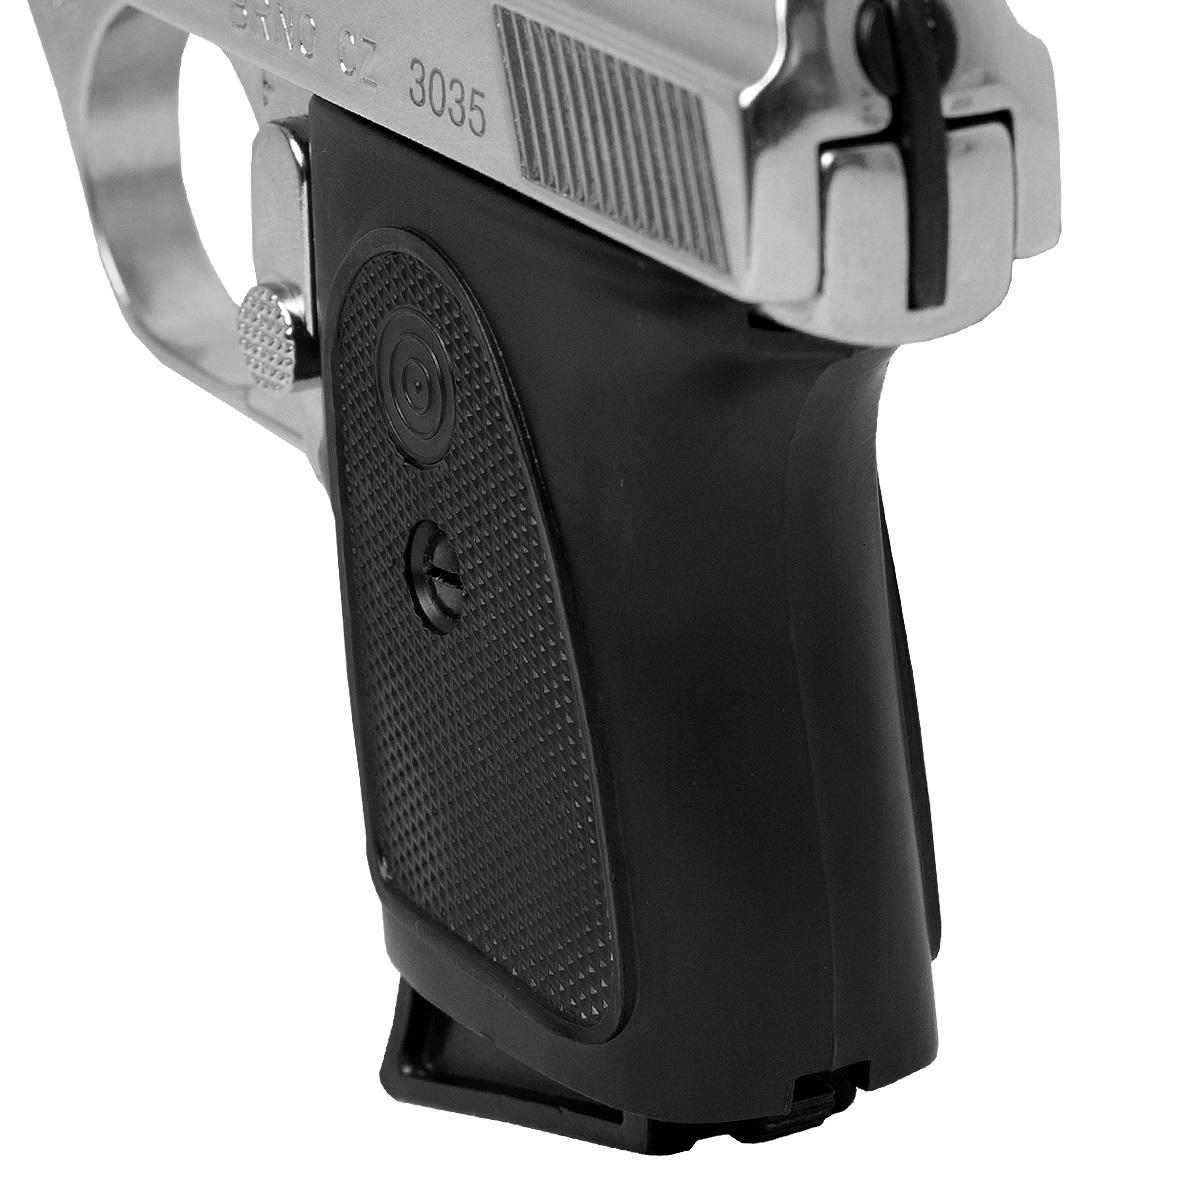 Pistola ALFA PROJ BRNO CZ3035 Cal. 6,35MM 6+1 - Niquelada